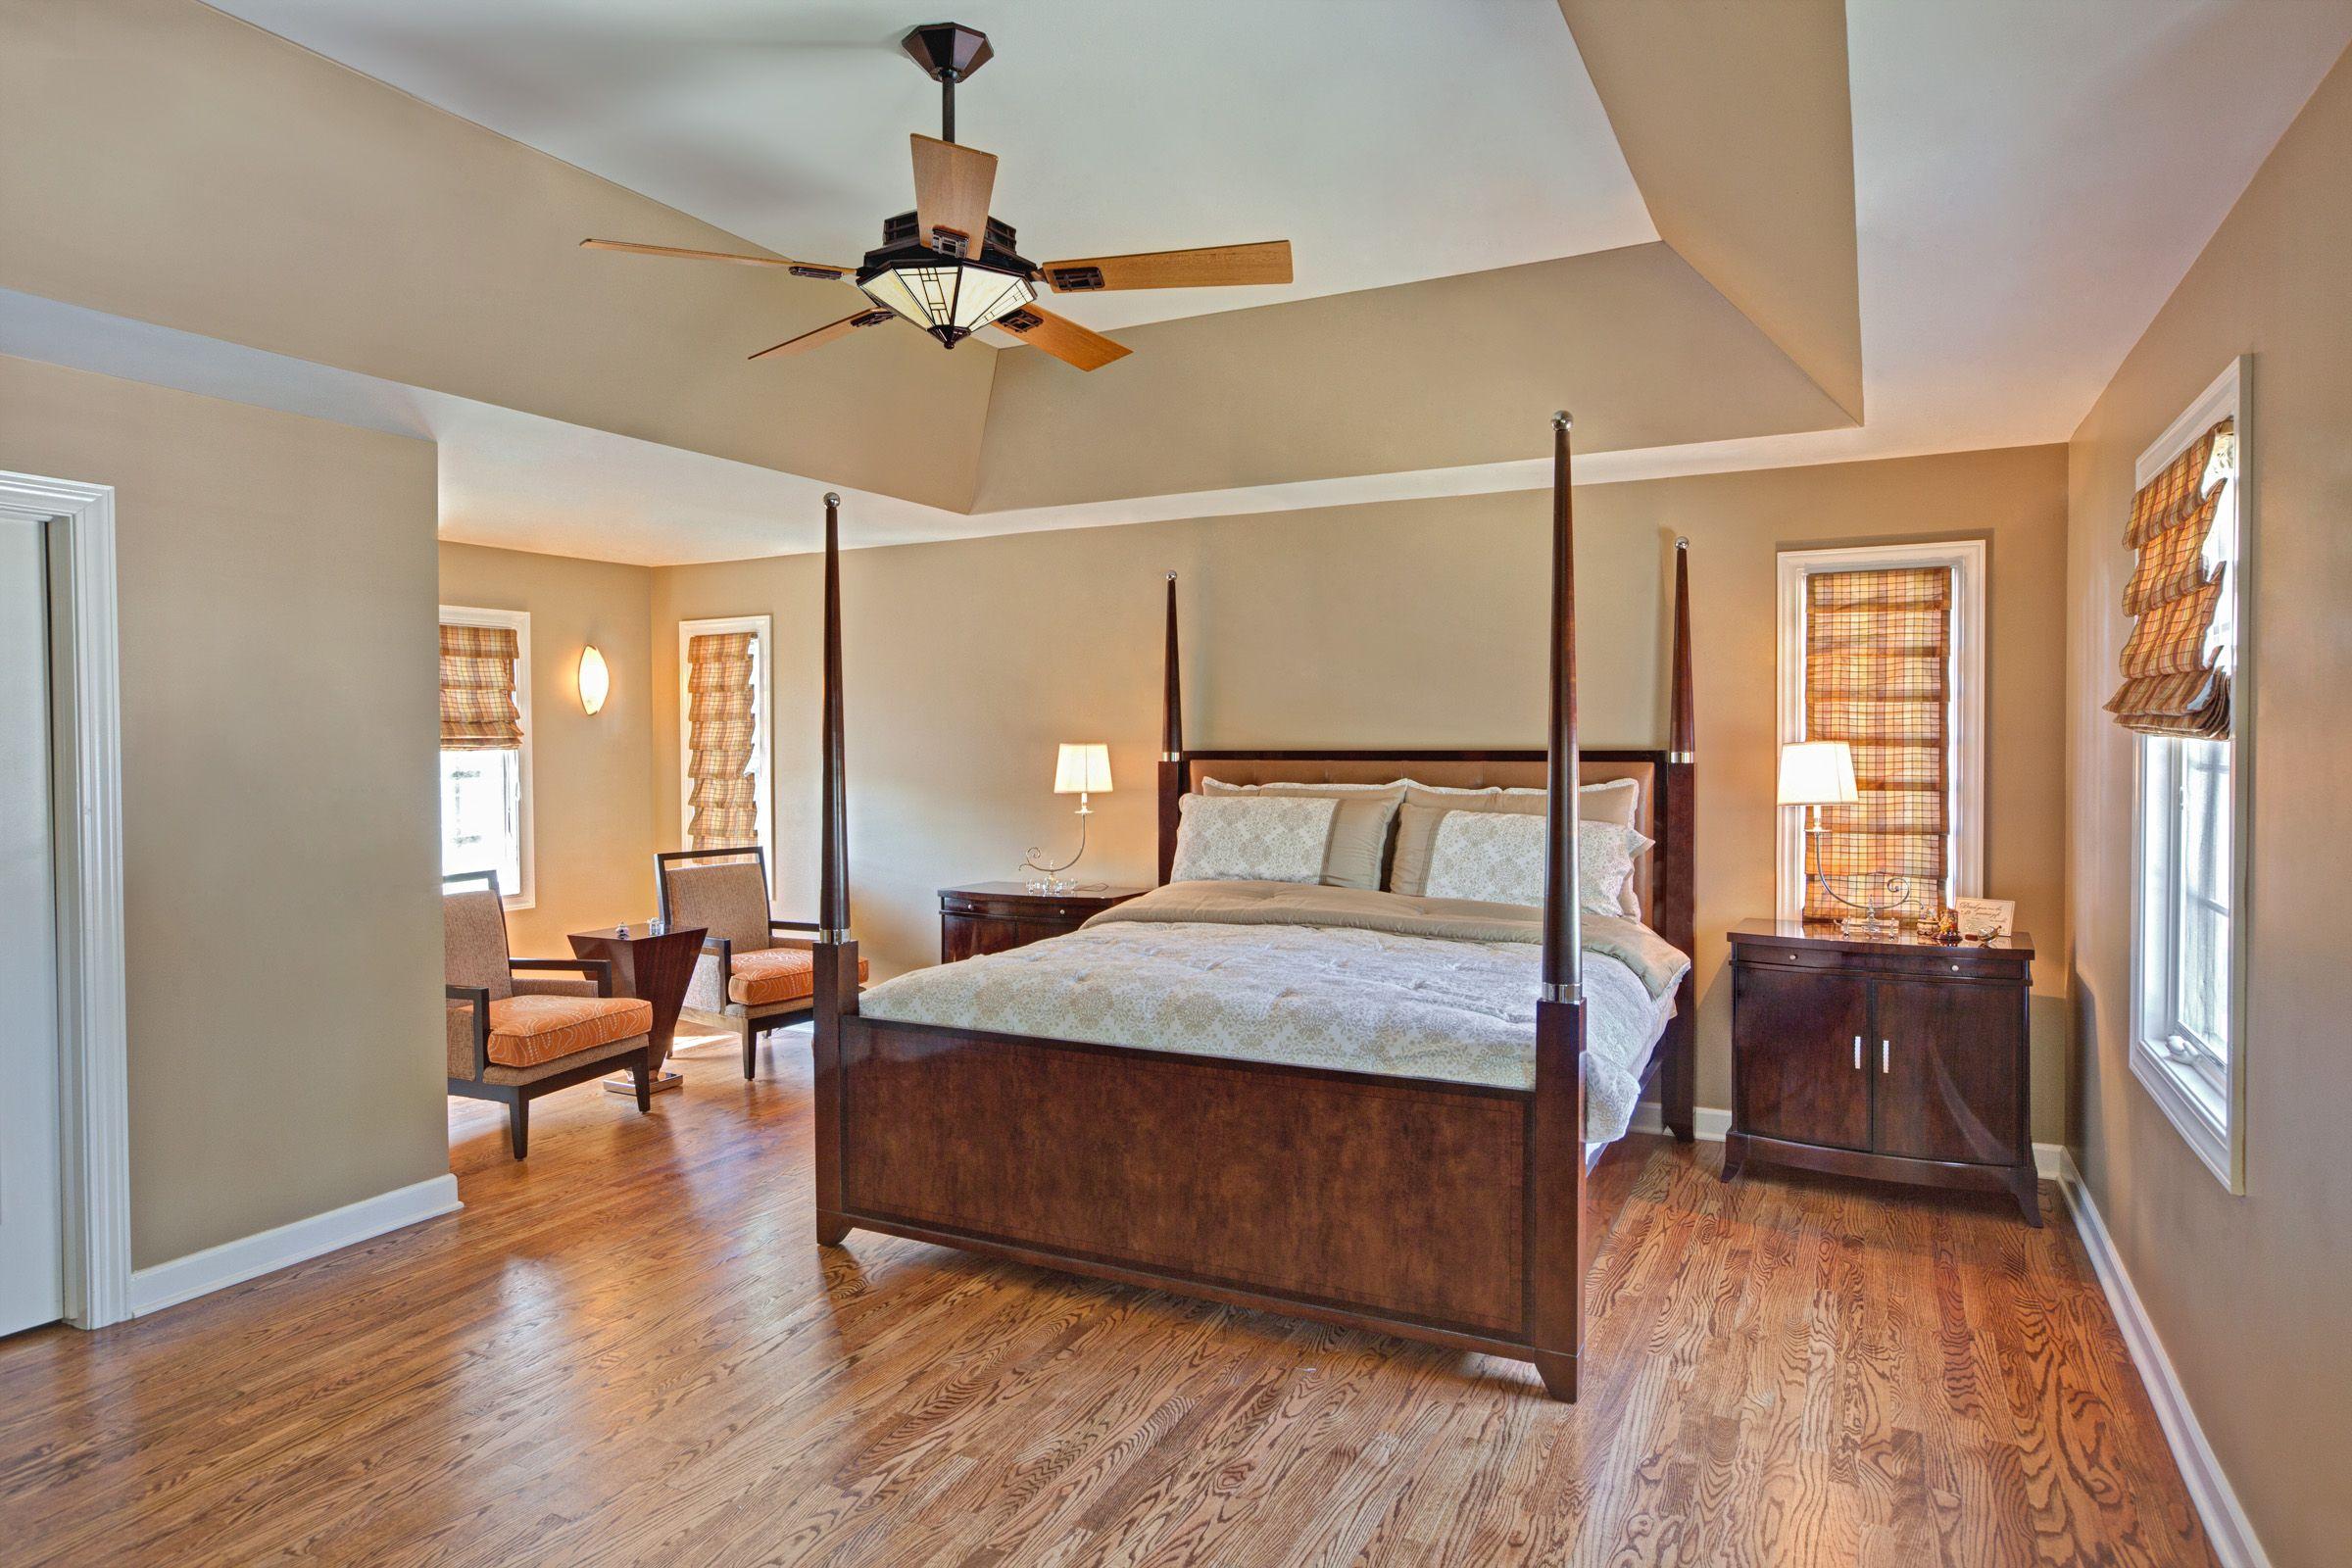 Best Second Floor Addition Skokie Il Home Additions 640 x 480